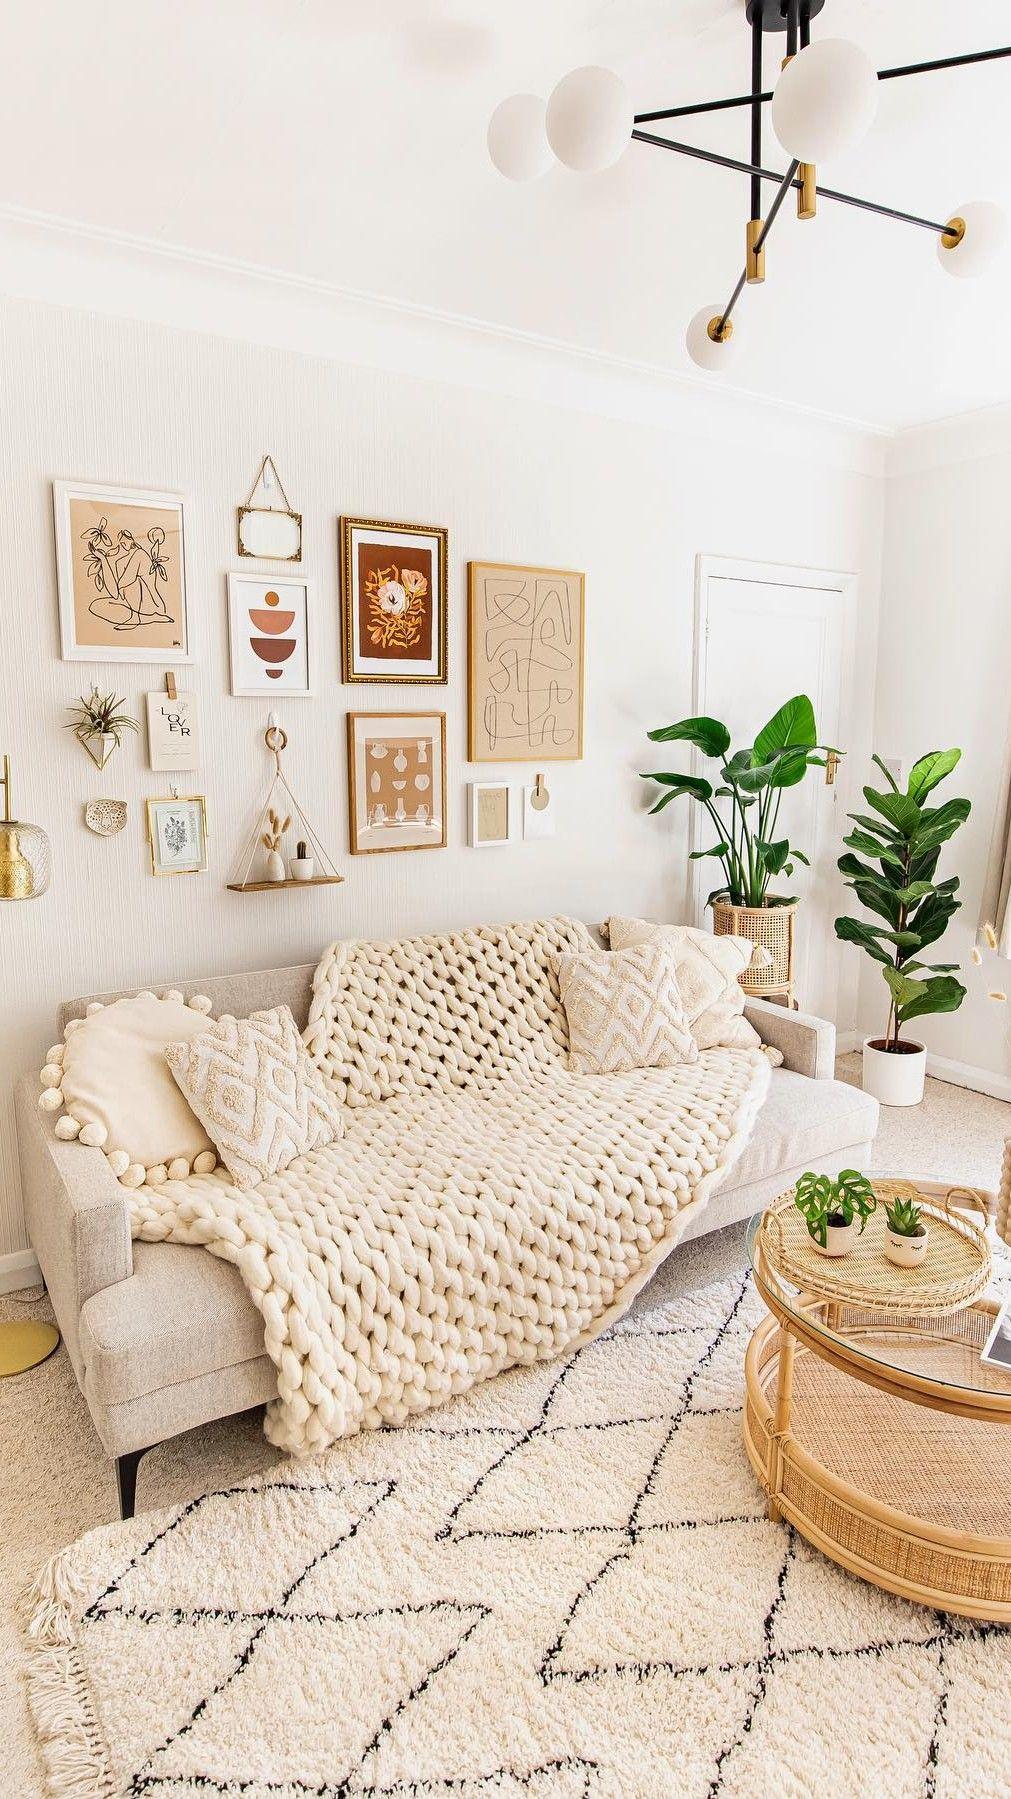 20 Magnificent Living Room Decor Ideas